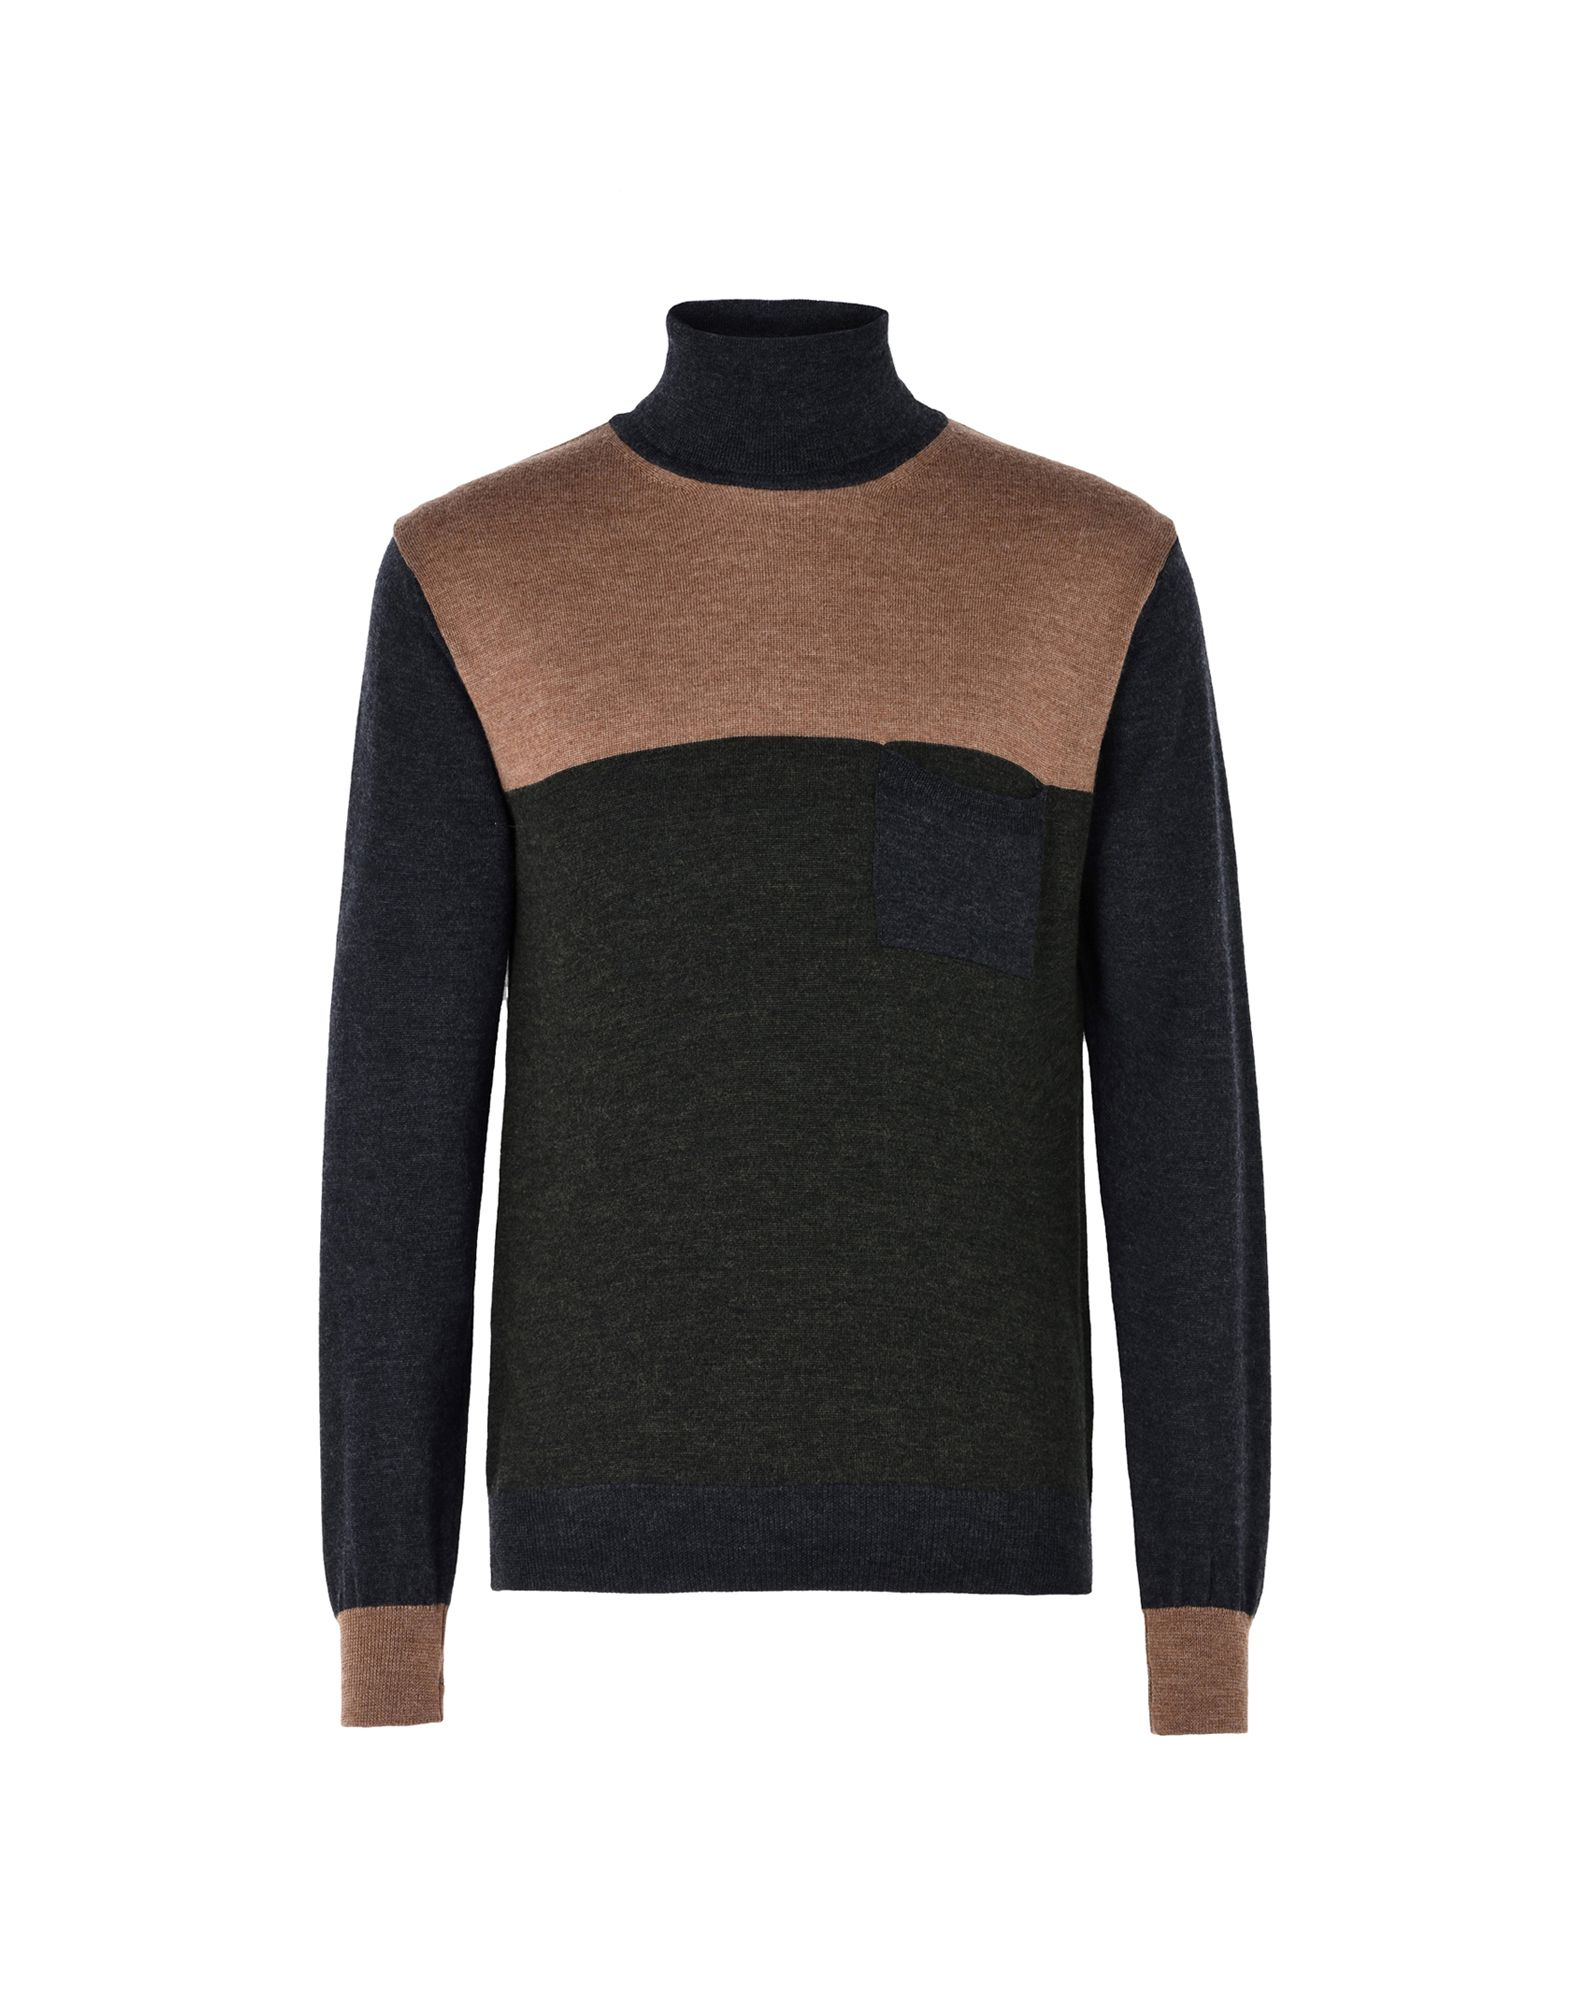 Fashion Shop - 8 Turtlenecks - Item 39801468